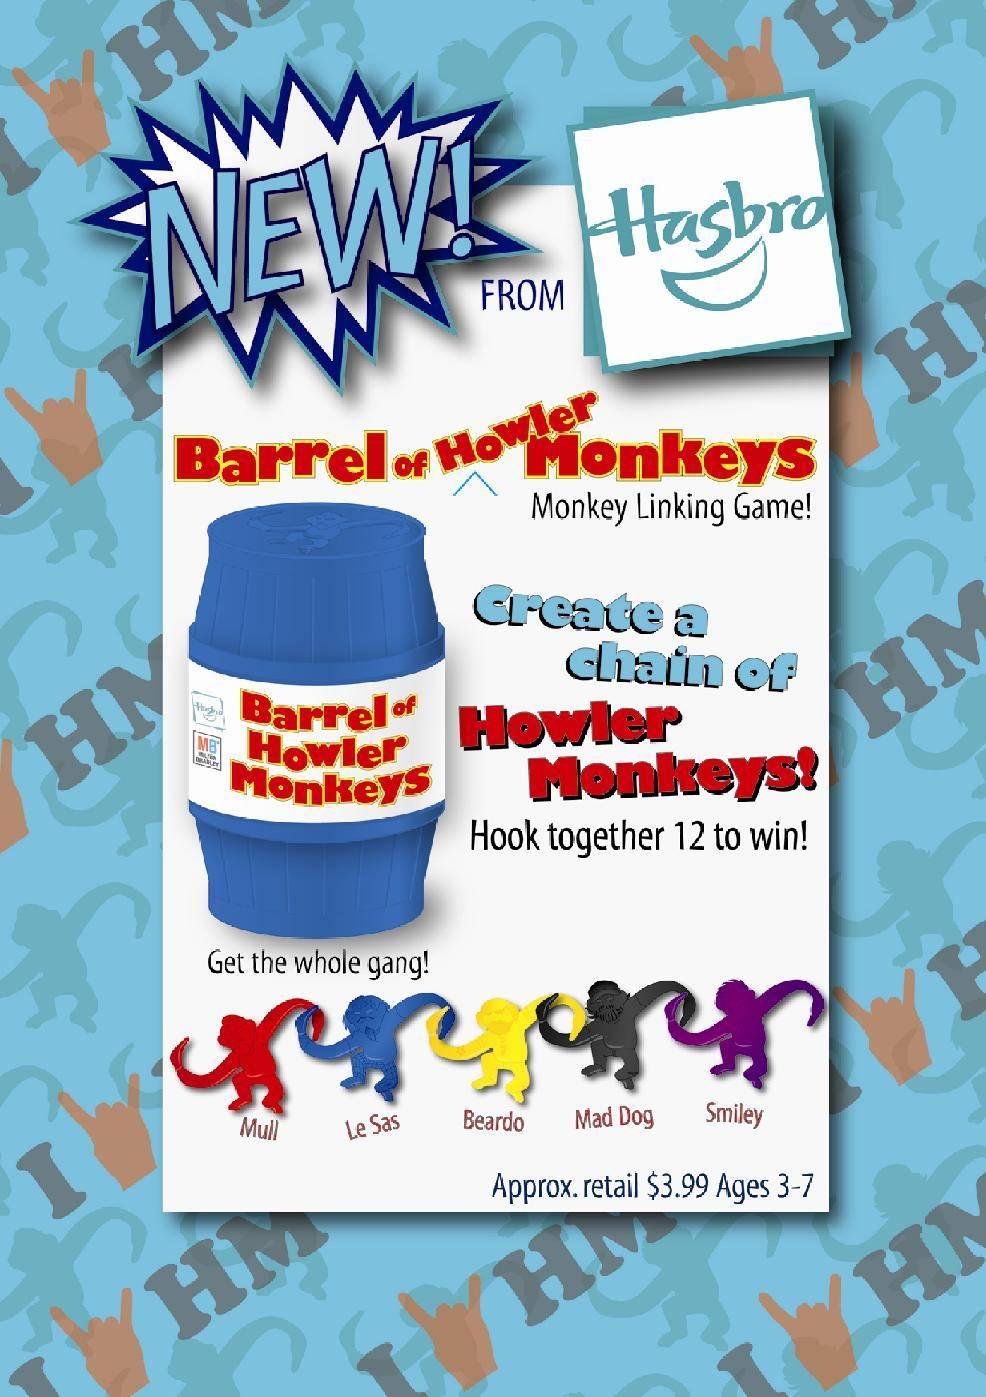 Special Episode 4/2 (57) - 'Barrel of Howler Monkeys' by Cecile O'Mara